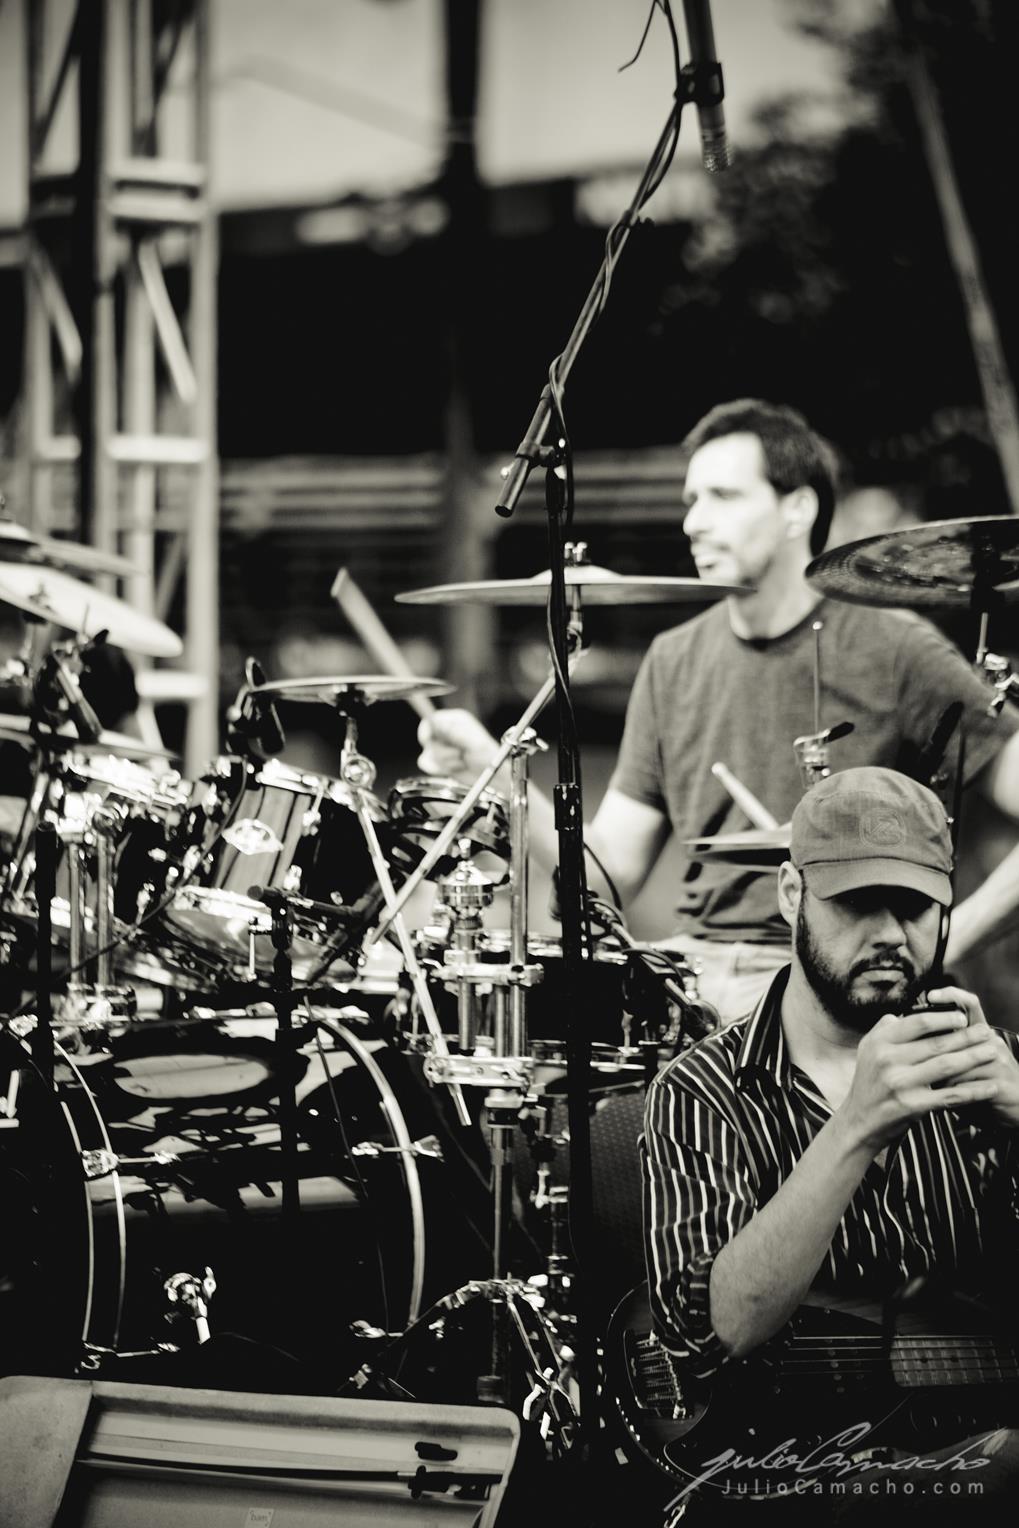 2014-10-30 31 CAST TOUR Ensenada y Tijuana - 1114 - www.Juli (Copy).jpg